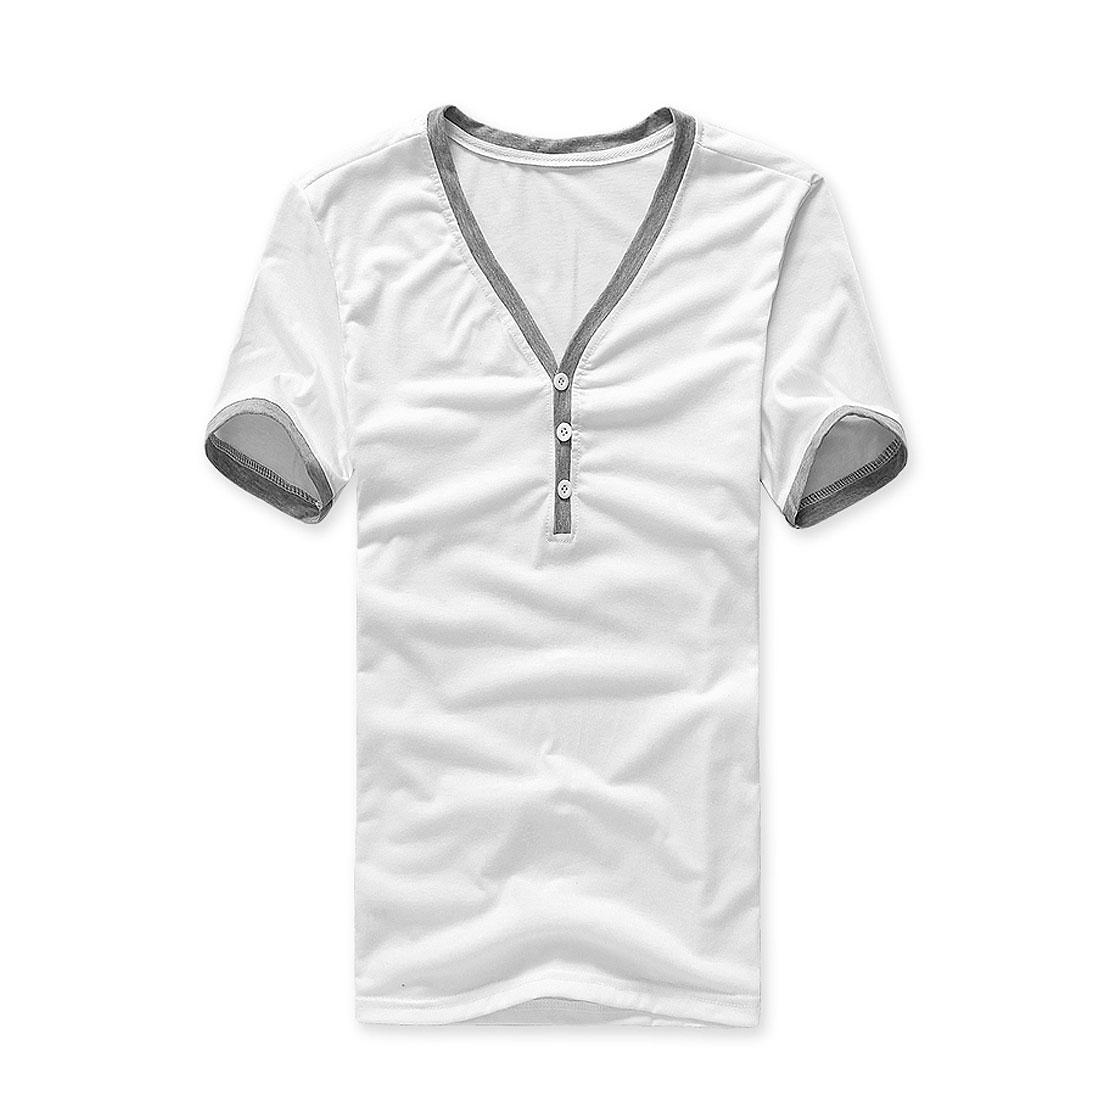 Men V Neck Button Front Up Short Sleeve Panel Neck T-shirt White M